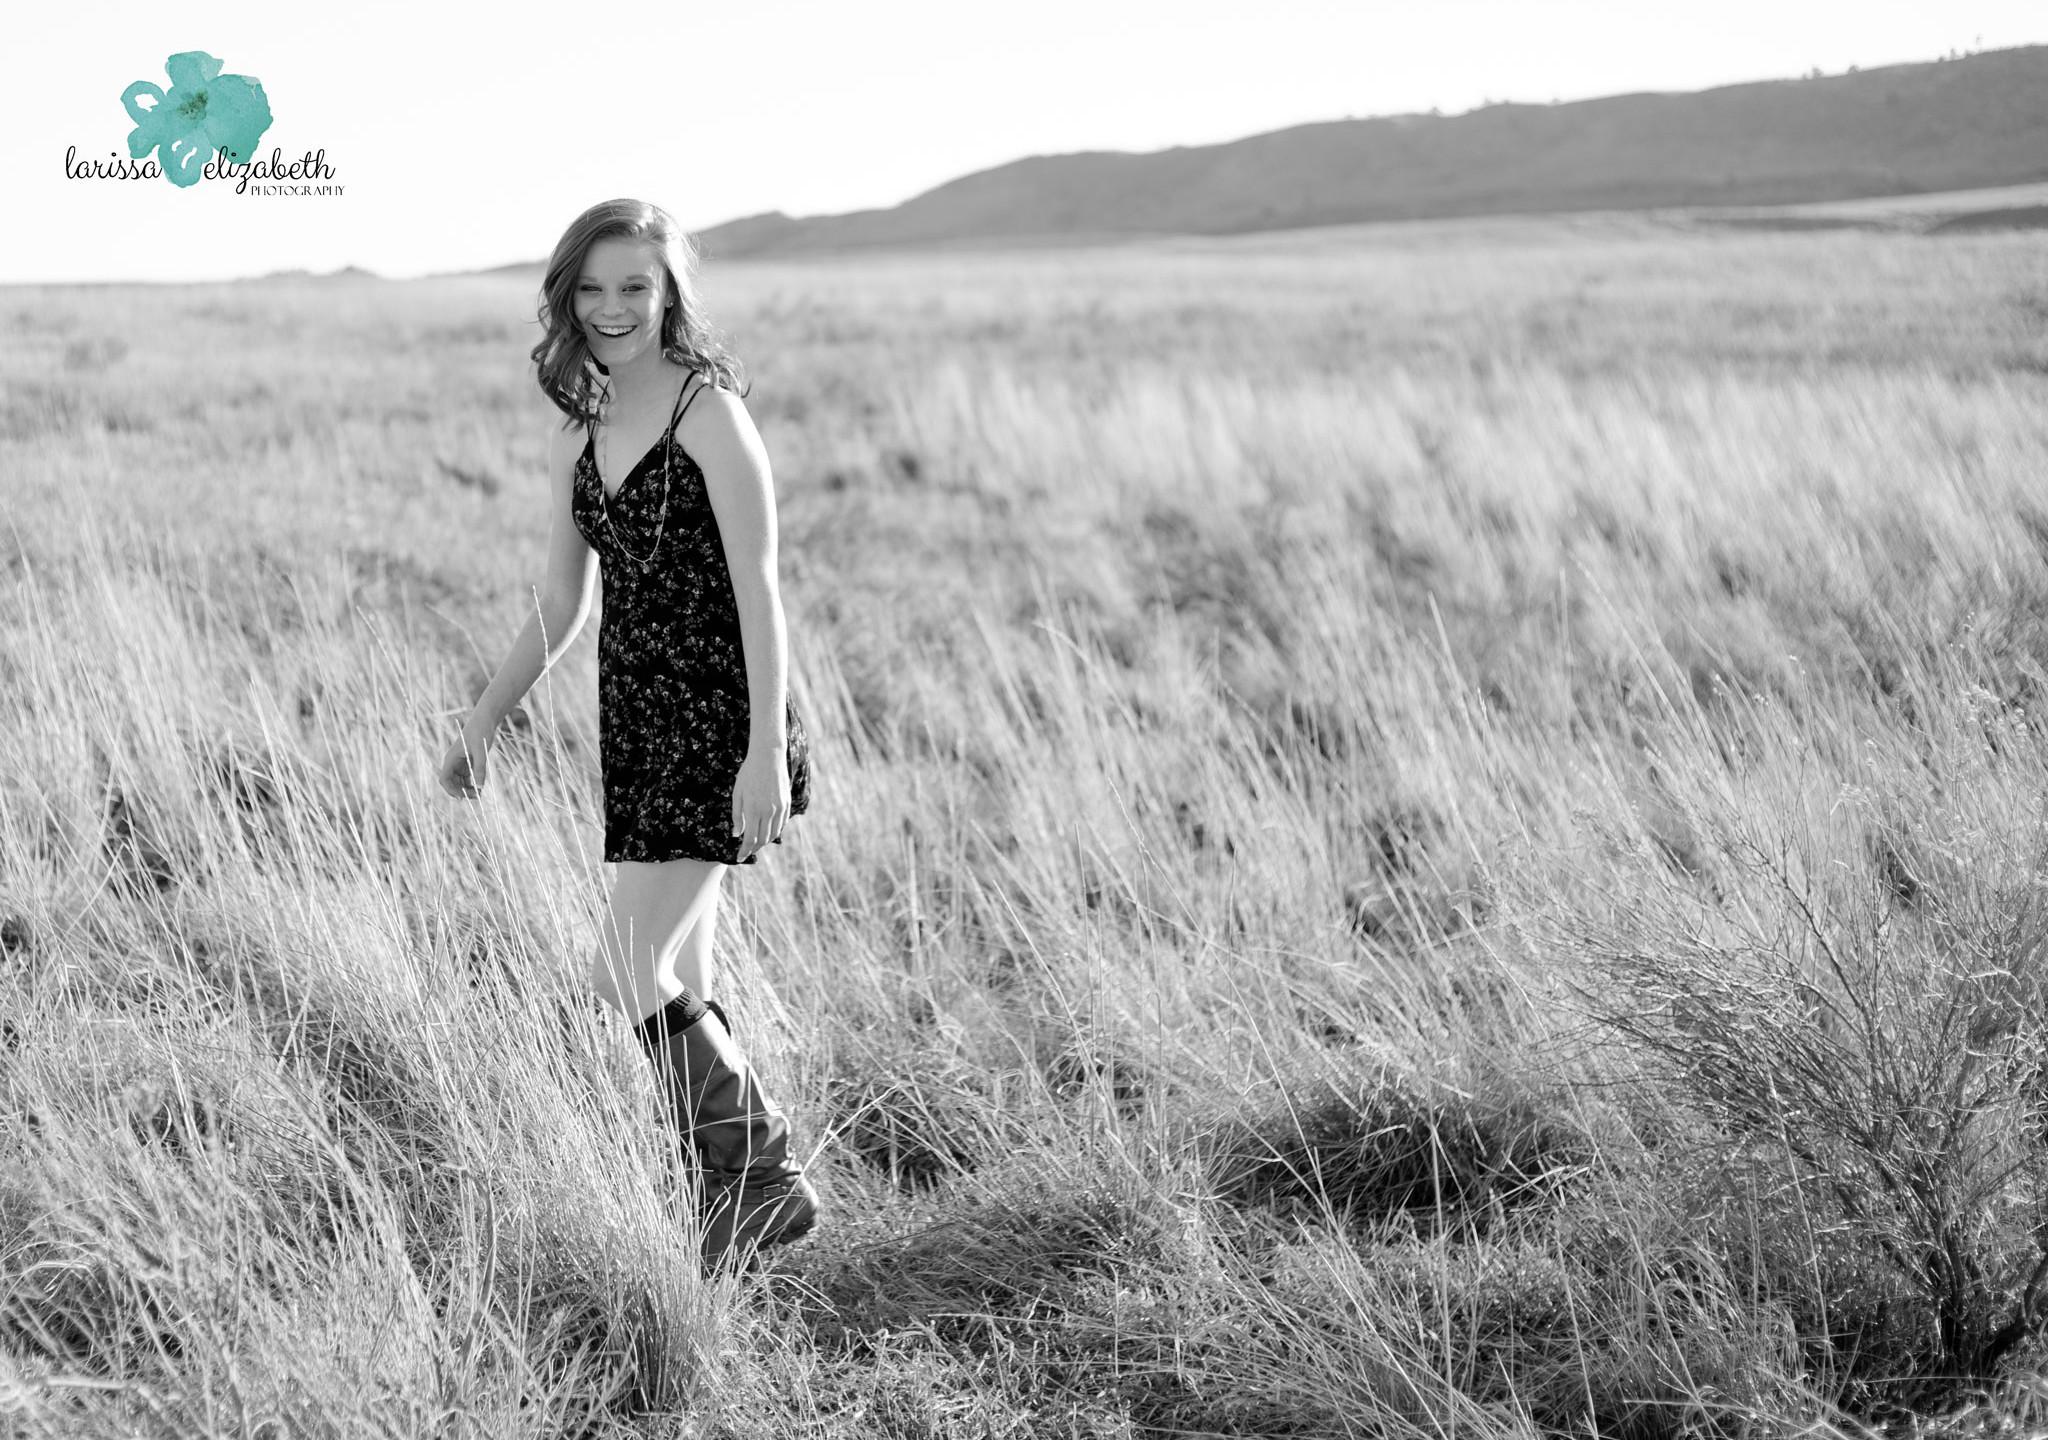 Grassy-Field-Senior-Girl